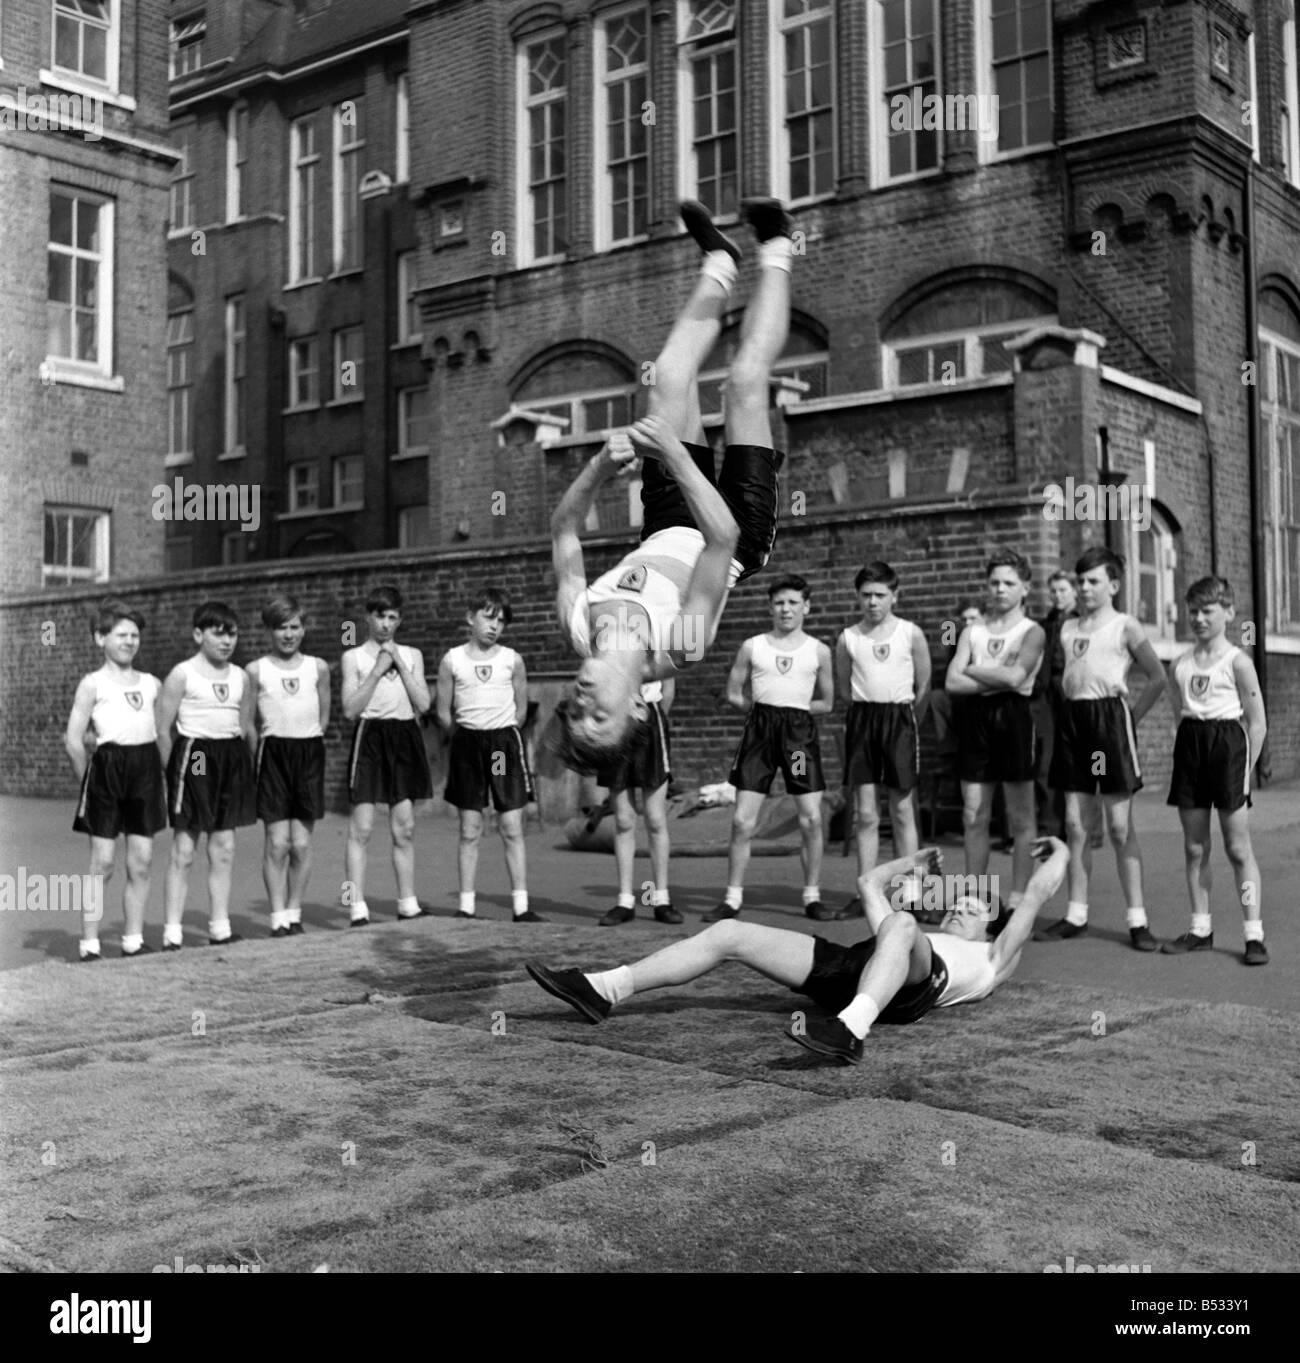 William Blake Secondary School, Battersea. Gymnastics. March 1952 C1257 - Stock Image